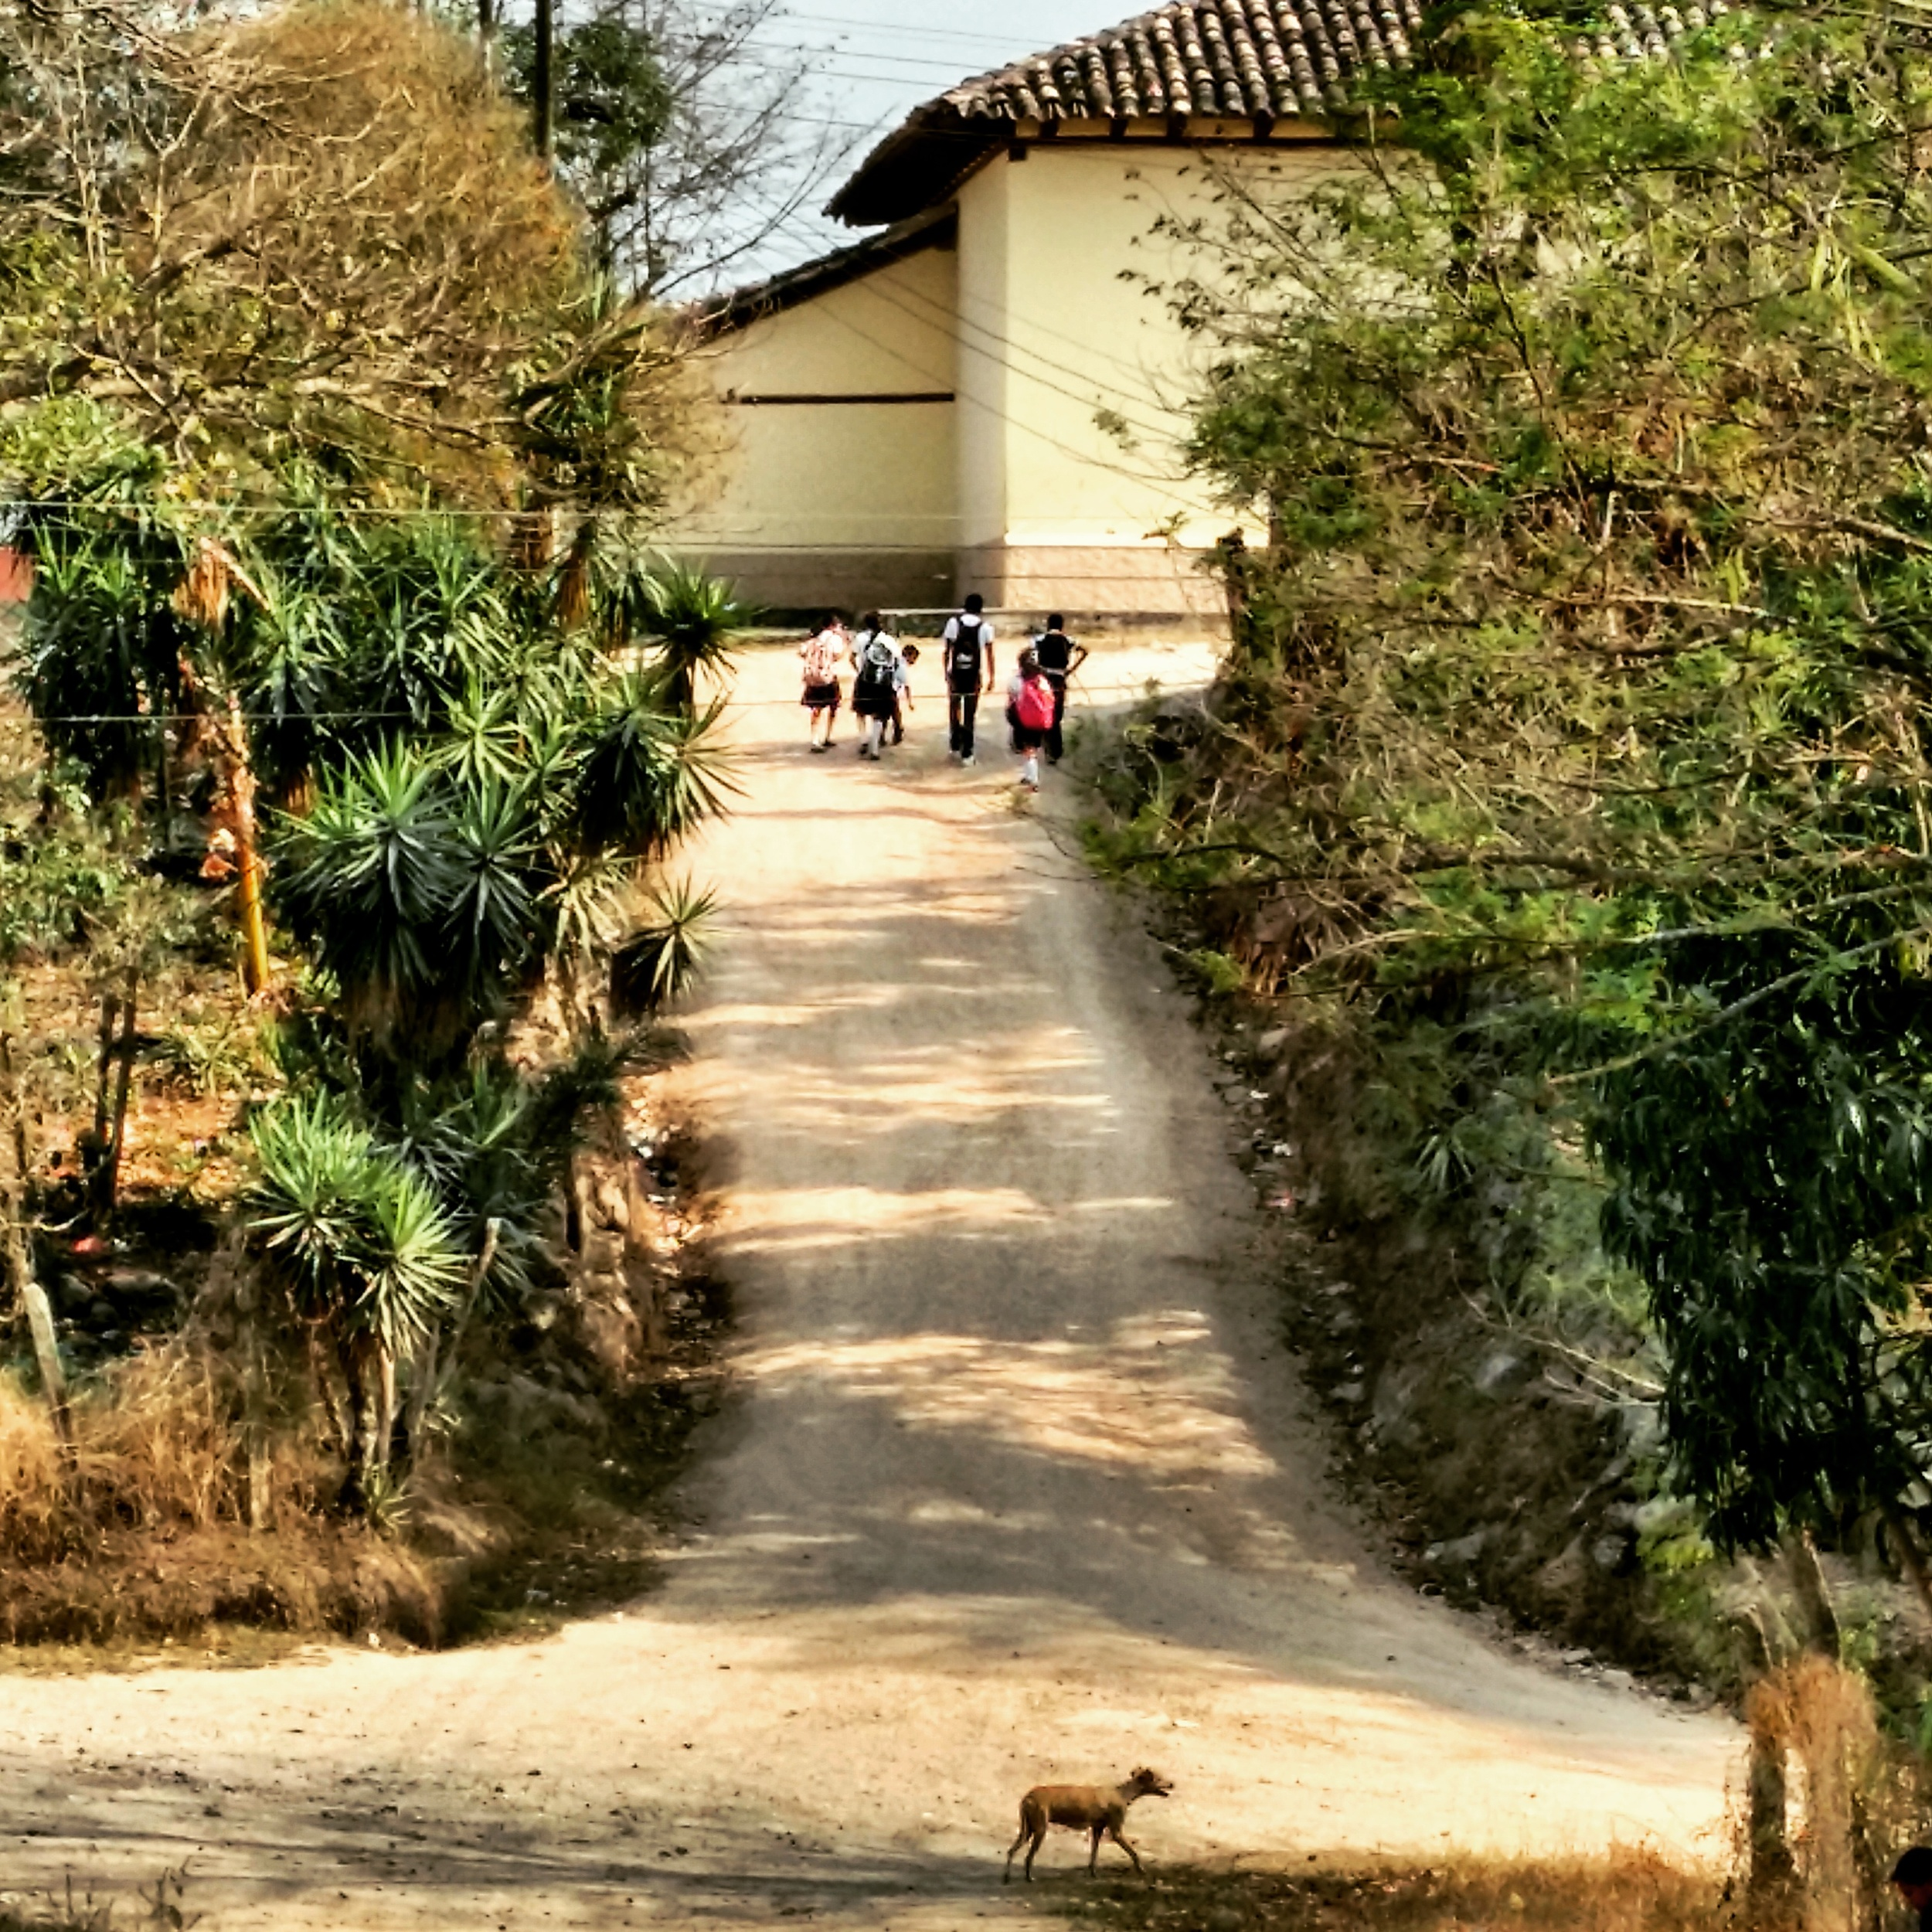 Pediatric patients walk home from clinic in Belen, Honduras.